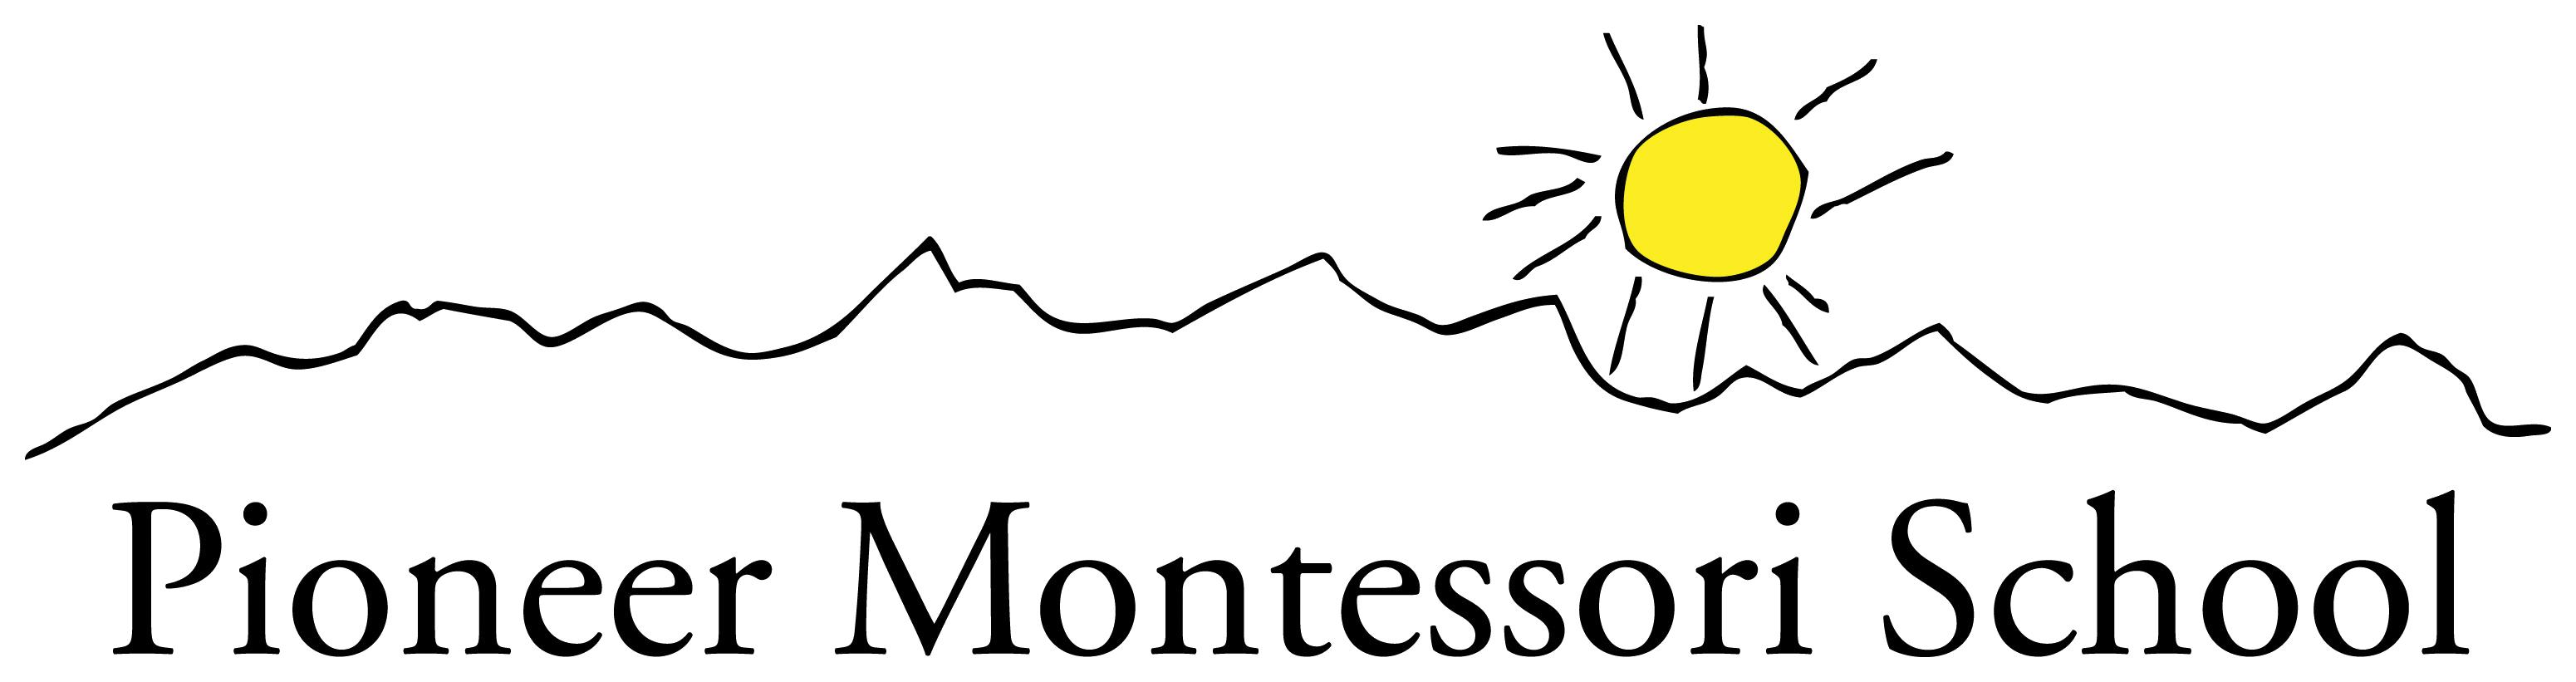 Pioneer Montessori School